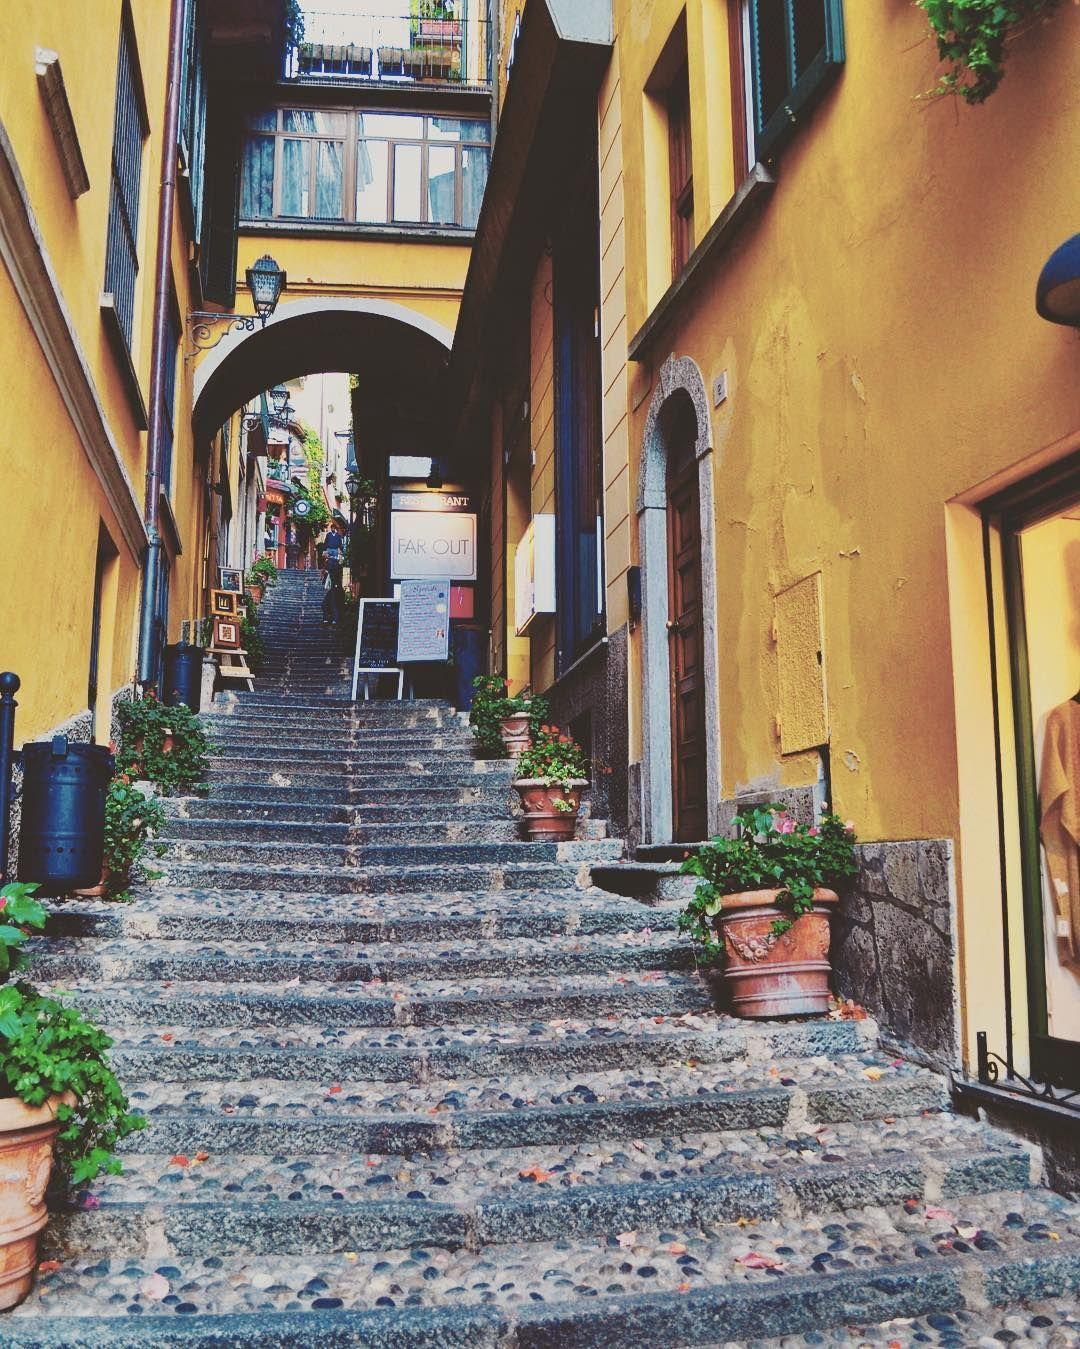 #bellagio #italia #italy #lake #lakecomo #lago #love #pic #picture #photooftheday #picoftheday #beautiful #lagodicomo #stairs #architecture #color #colorful #village #europe #ig_italy #instadaily #instaitalia #instapic #beauty #beautifulplaces #beautifulview